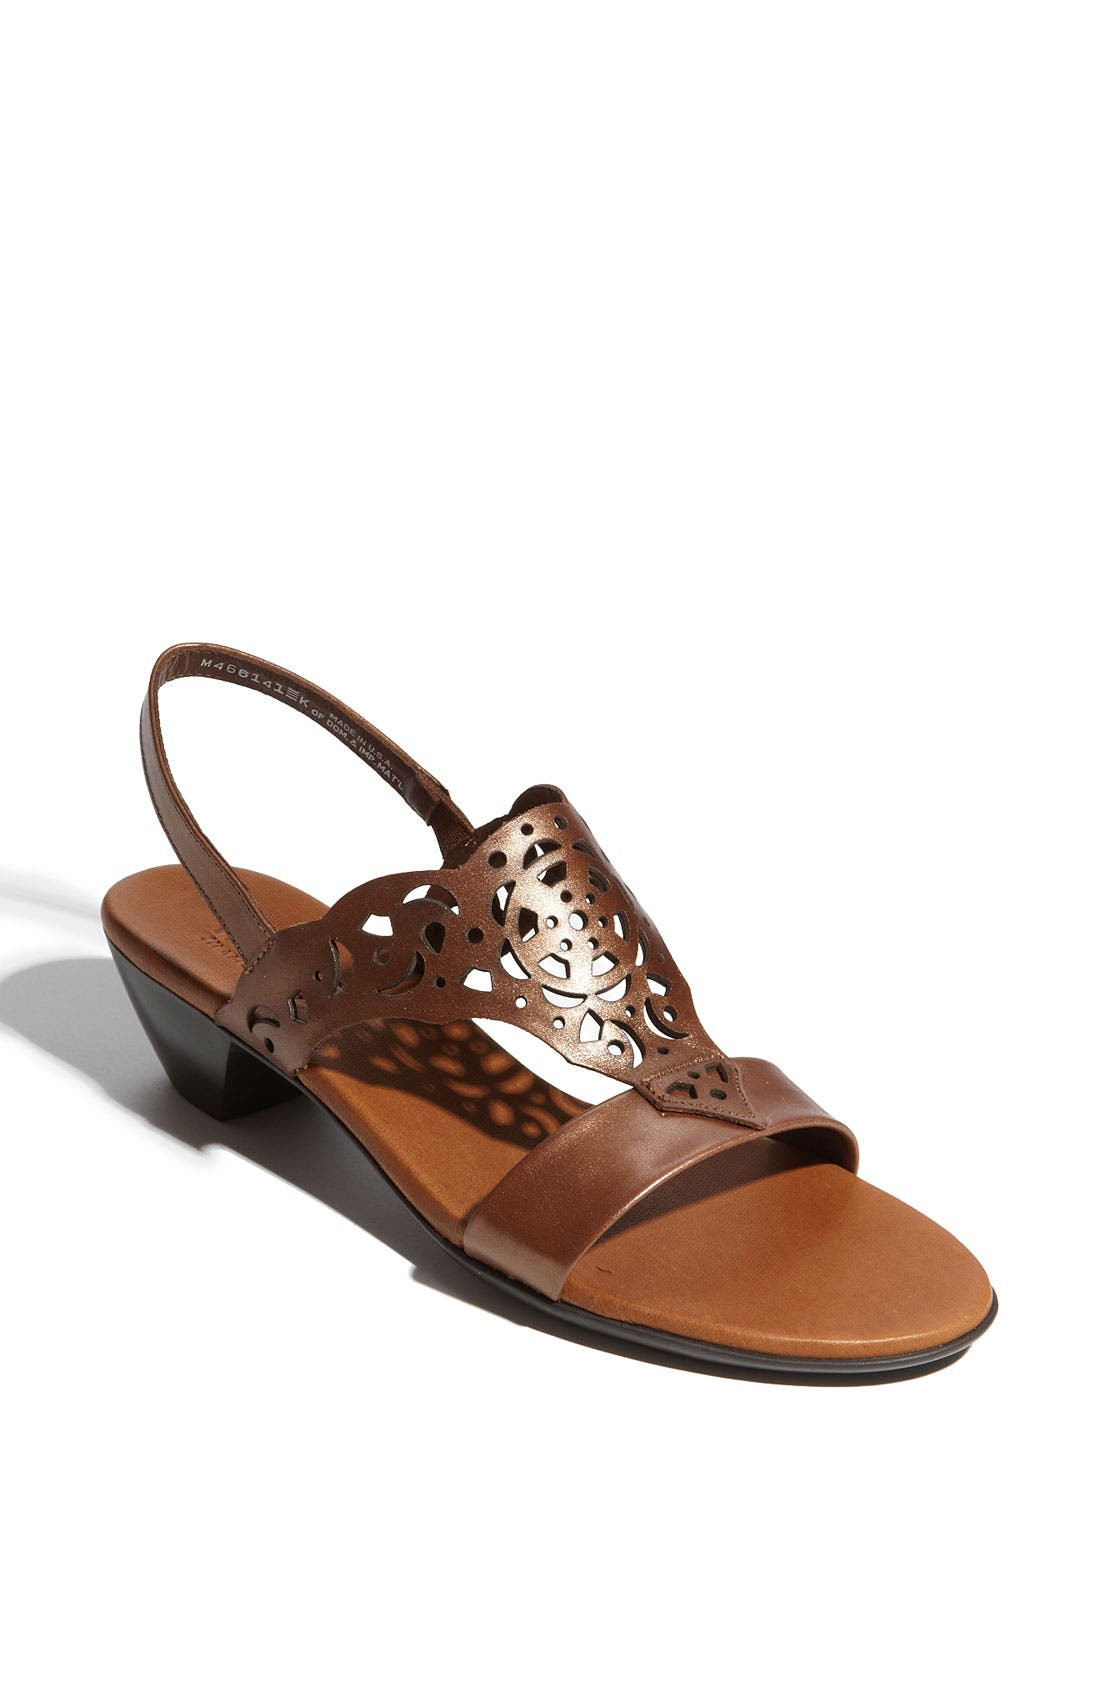 Main Image - Munro 'Tahiti' Sandal